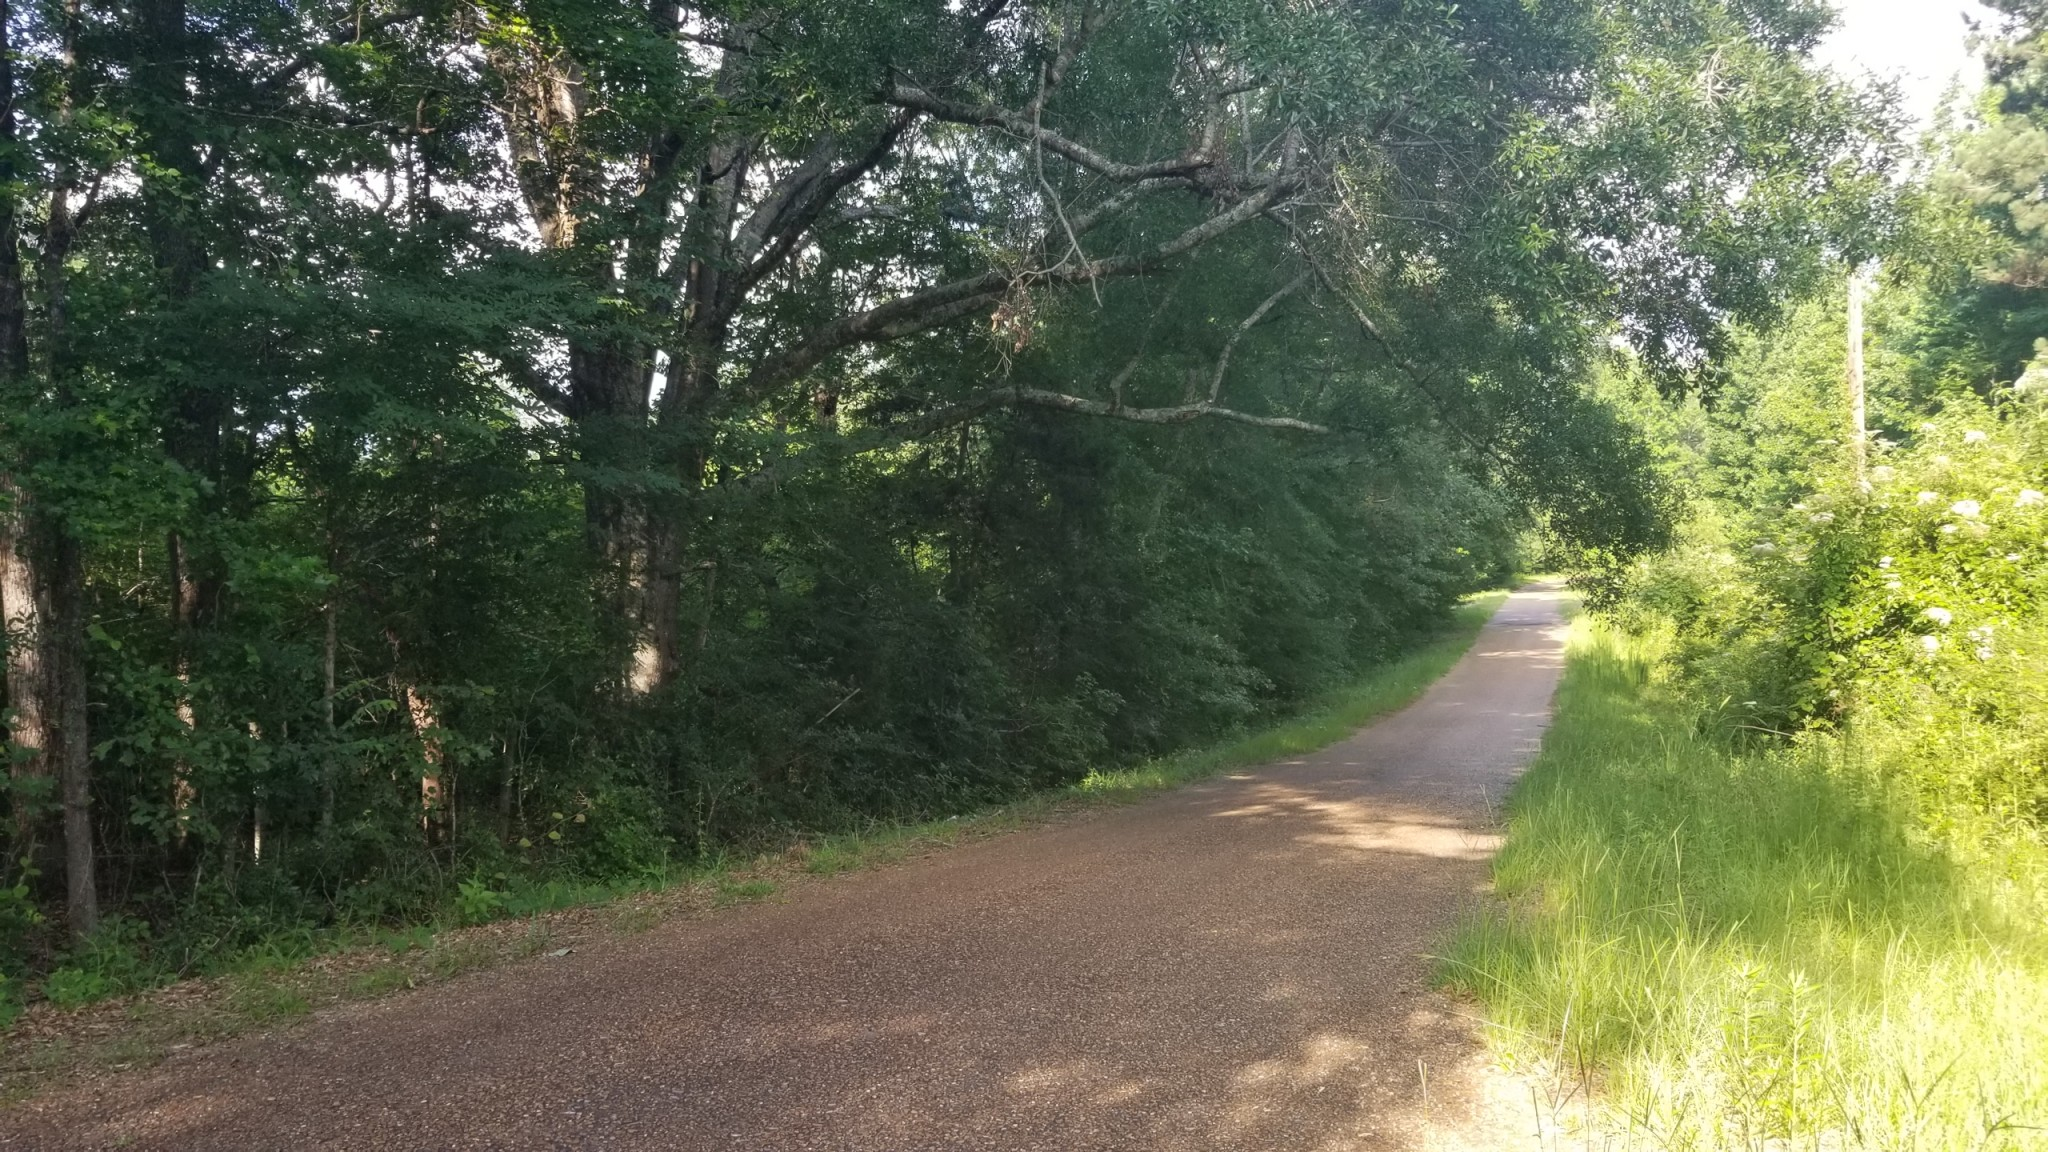 Brushy Creek Tract, LaSalle Parish, 60 Acres +/-